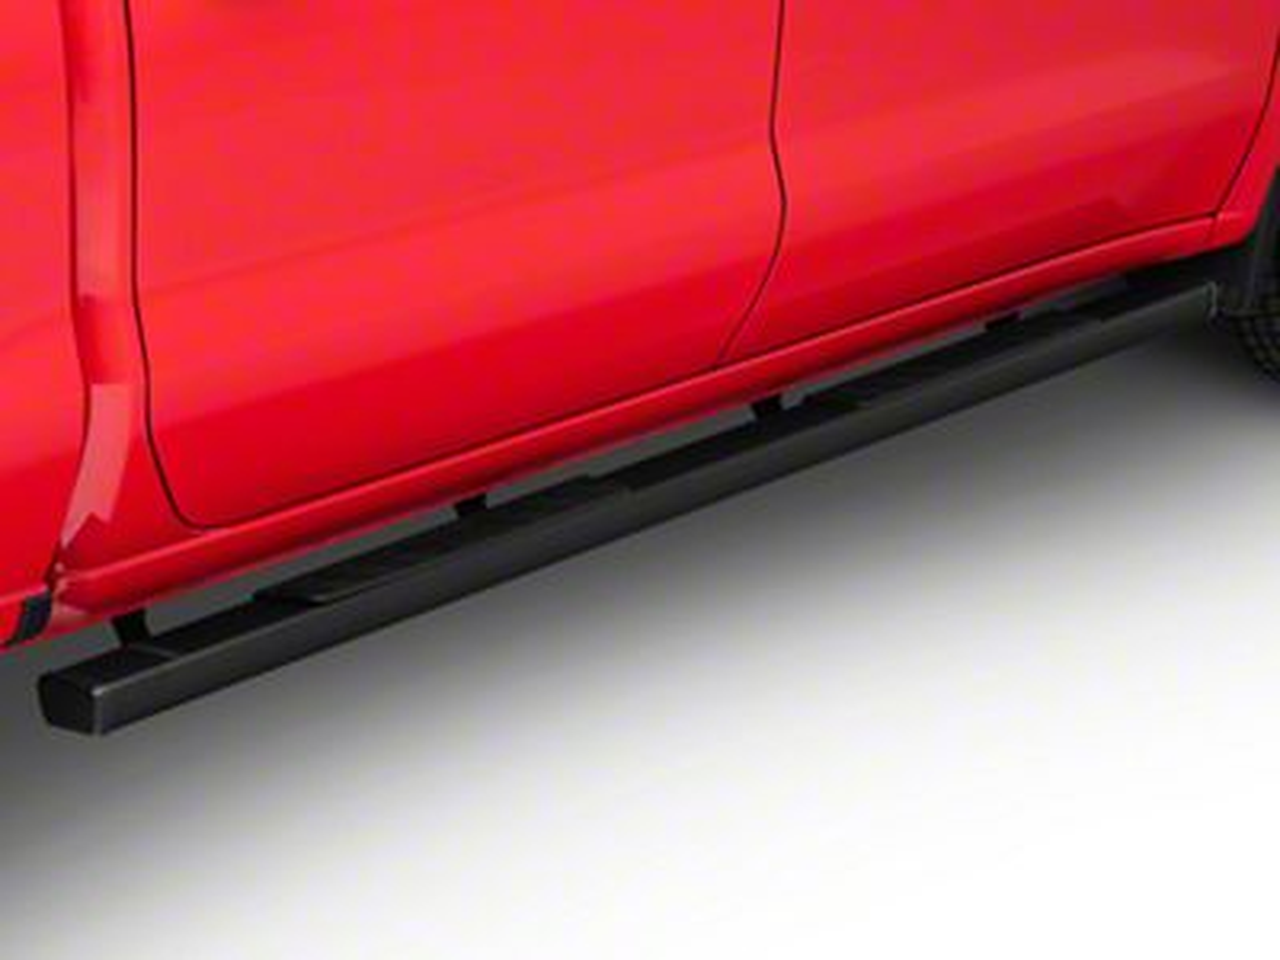 Duratrek T4 Side Step Bars - Black (2019 Silverado 1500 Crew Cab)